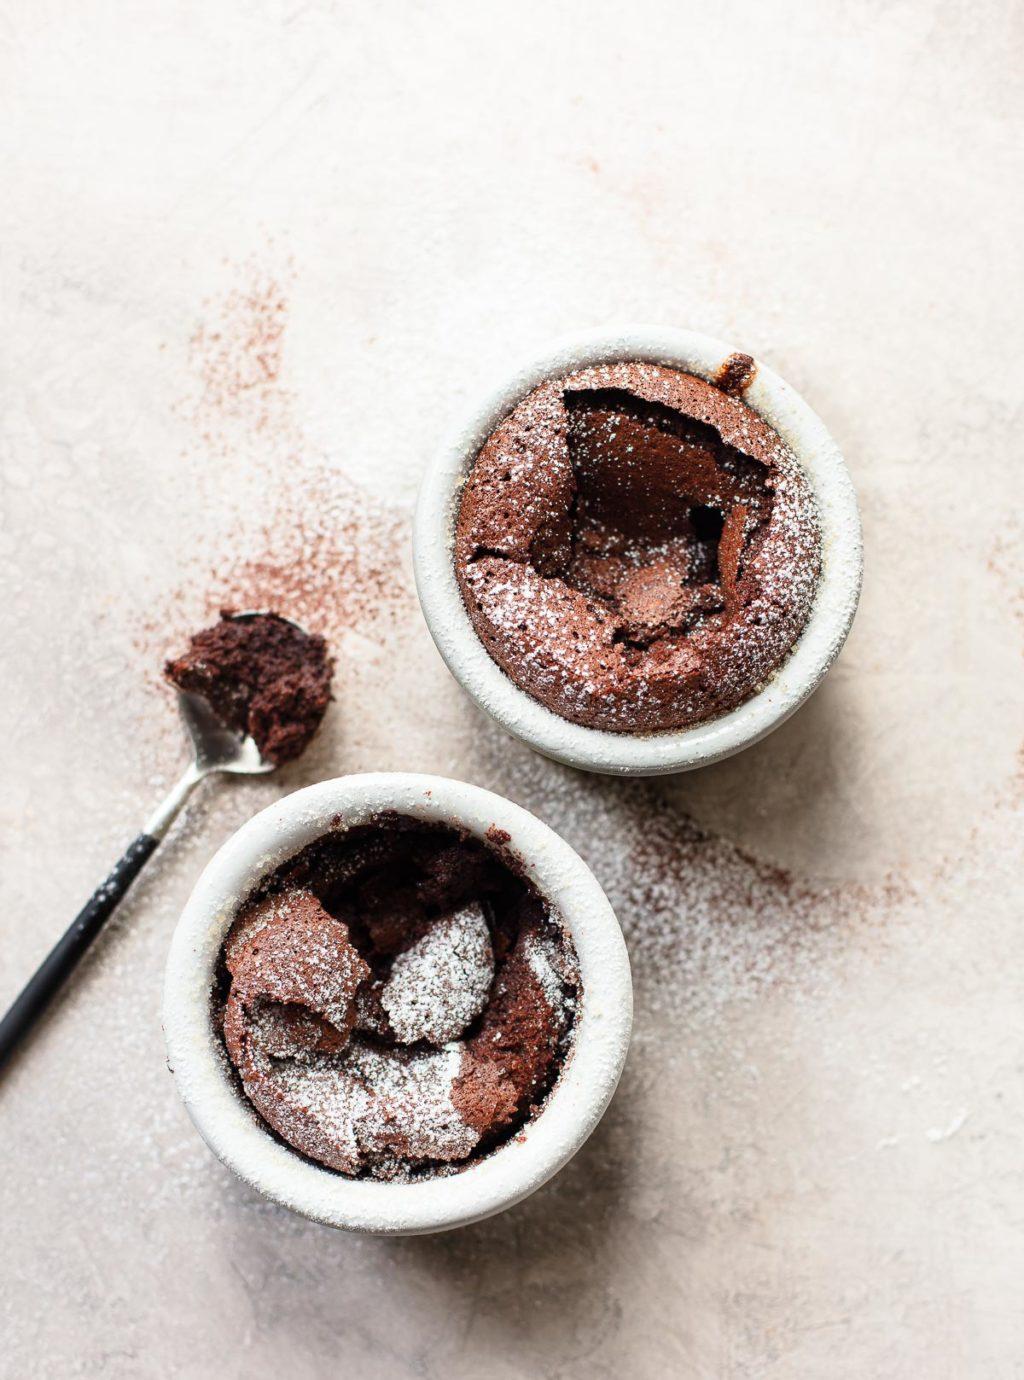 Warm Chocolate Souffle Cake